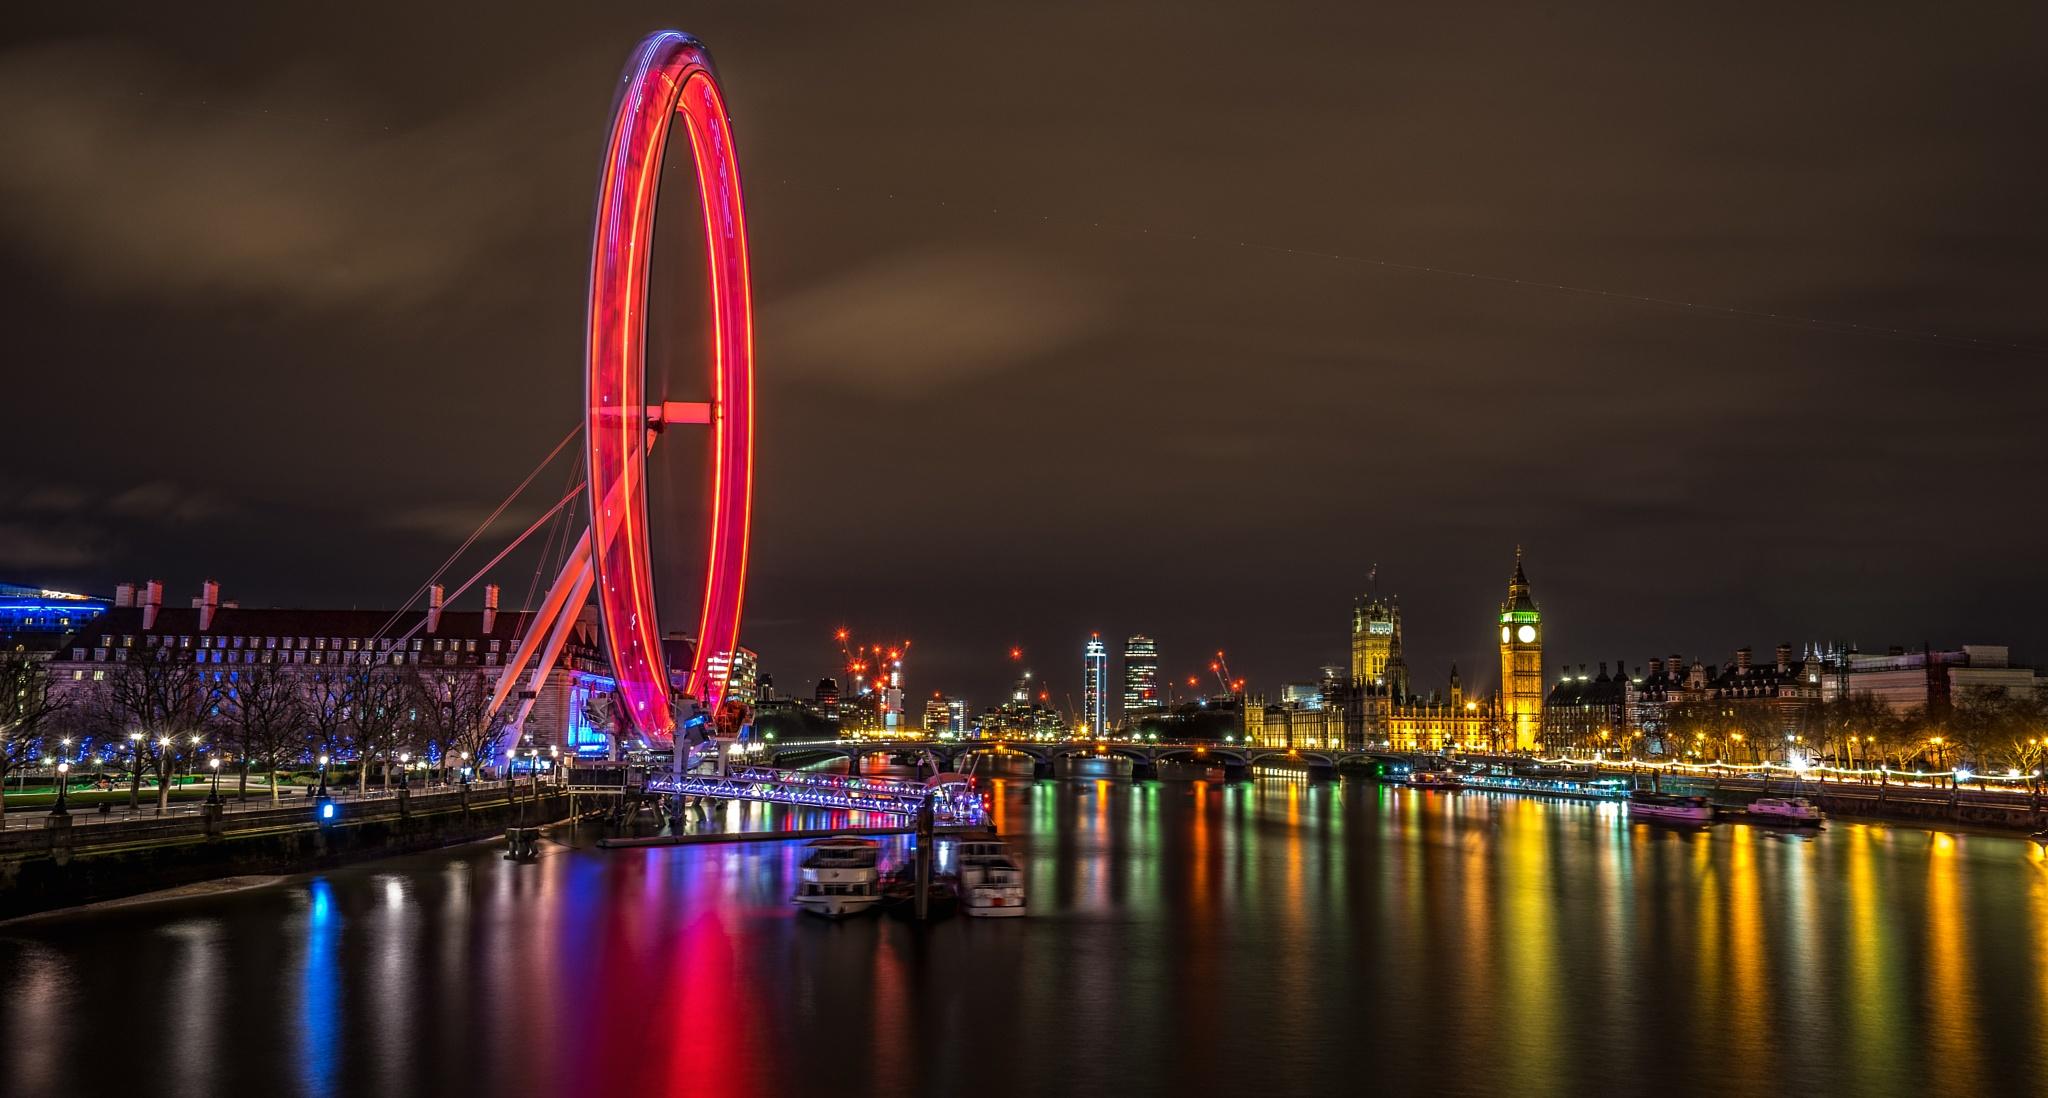 London Eye by Skapenas